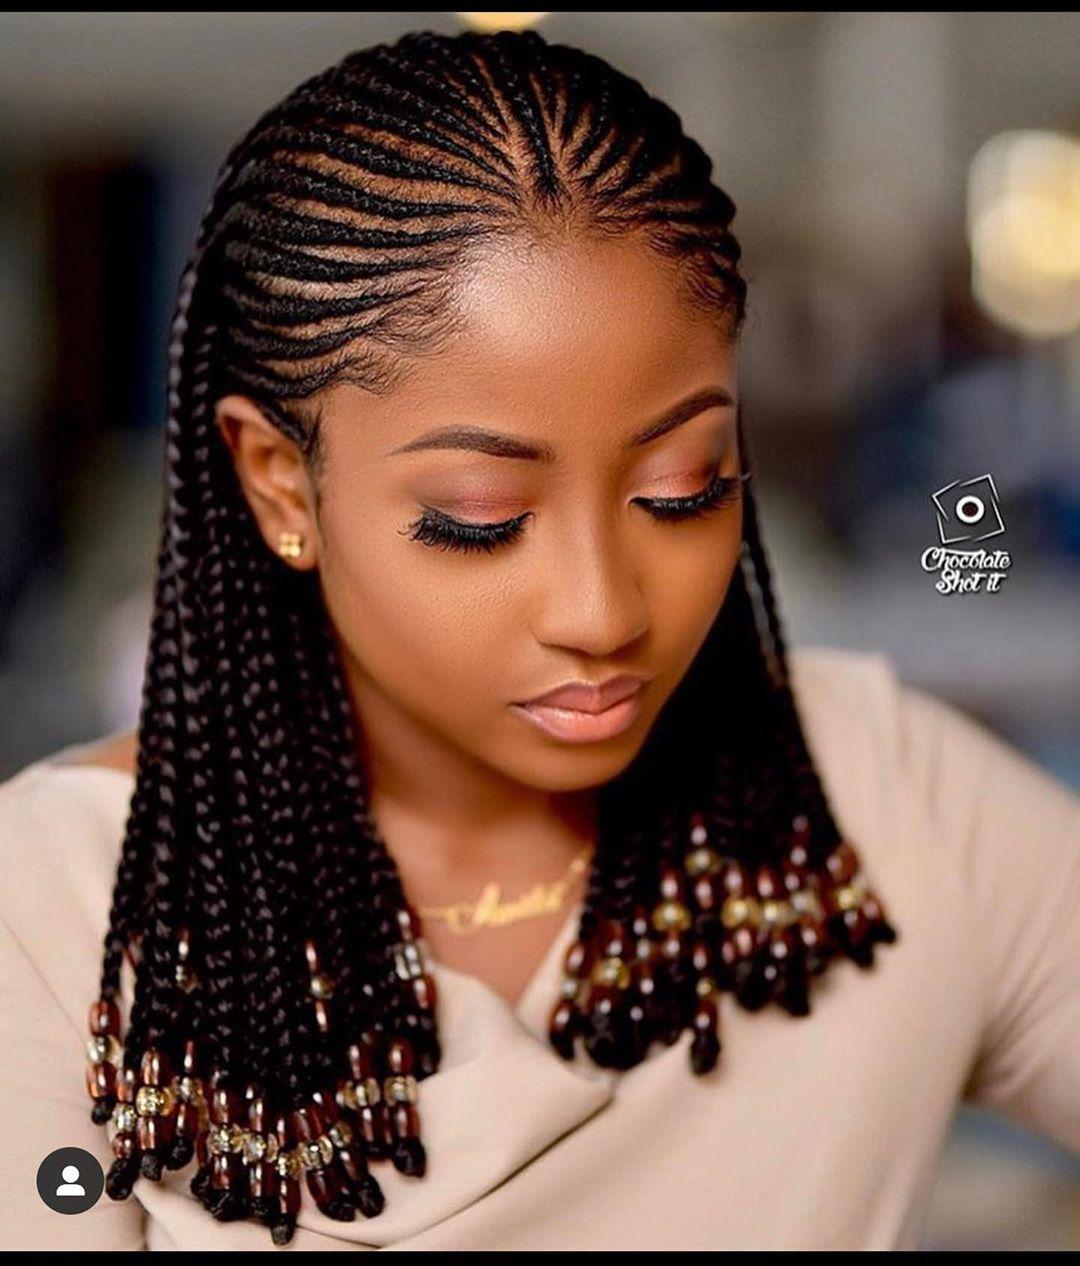 2020 Braids Hairstyles Ideas African Hairstyles African Hair Braiding Styles Bob Braids Hairstyles